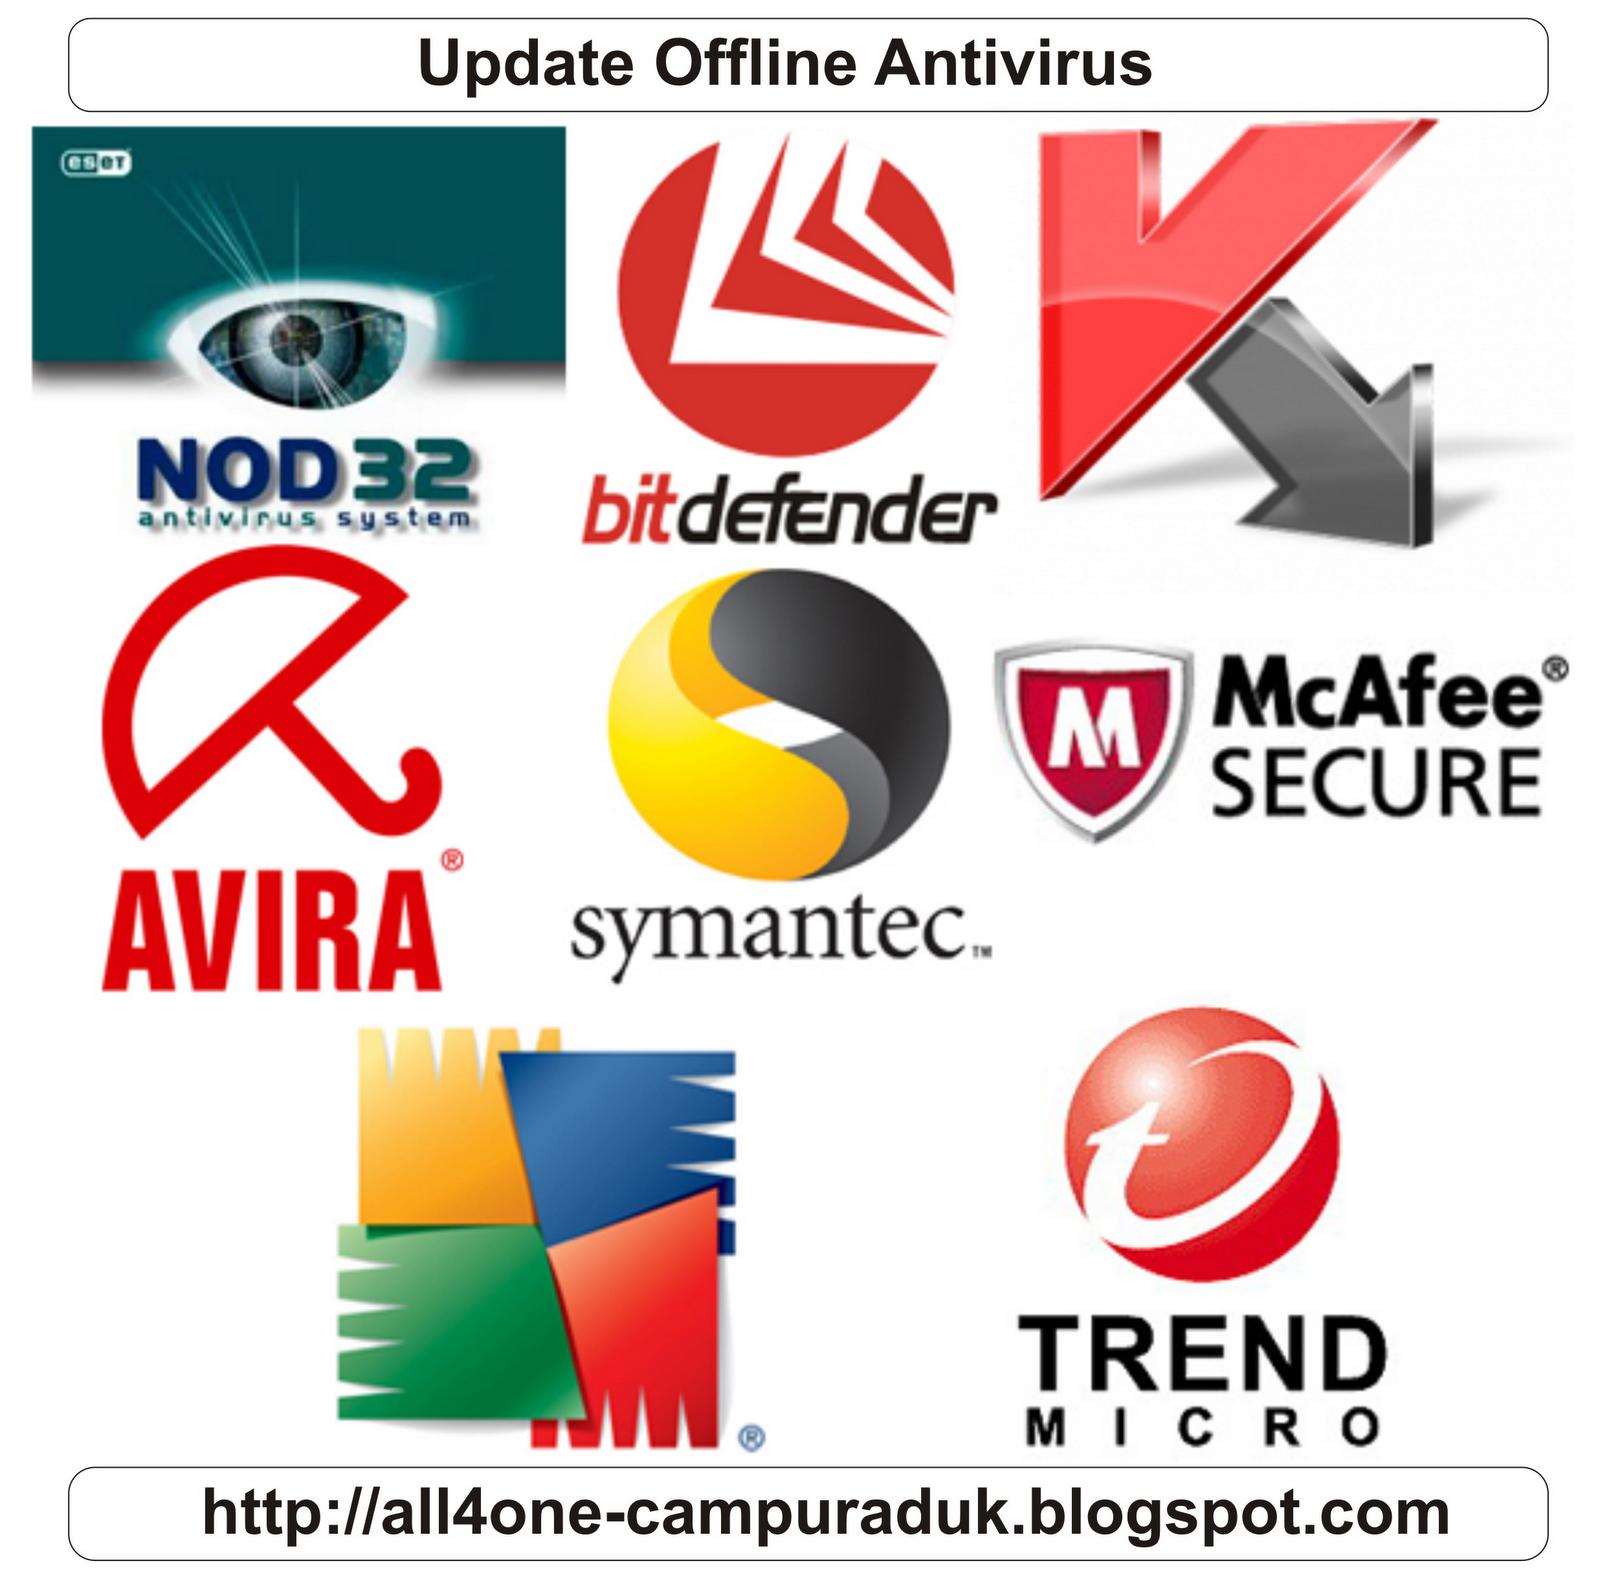 Campur Aduk: Daftar Update Offline Antivirus